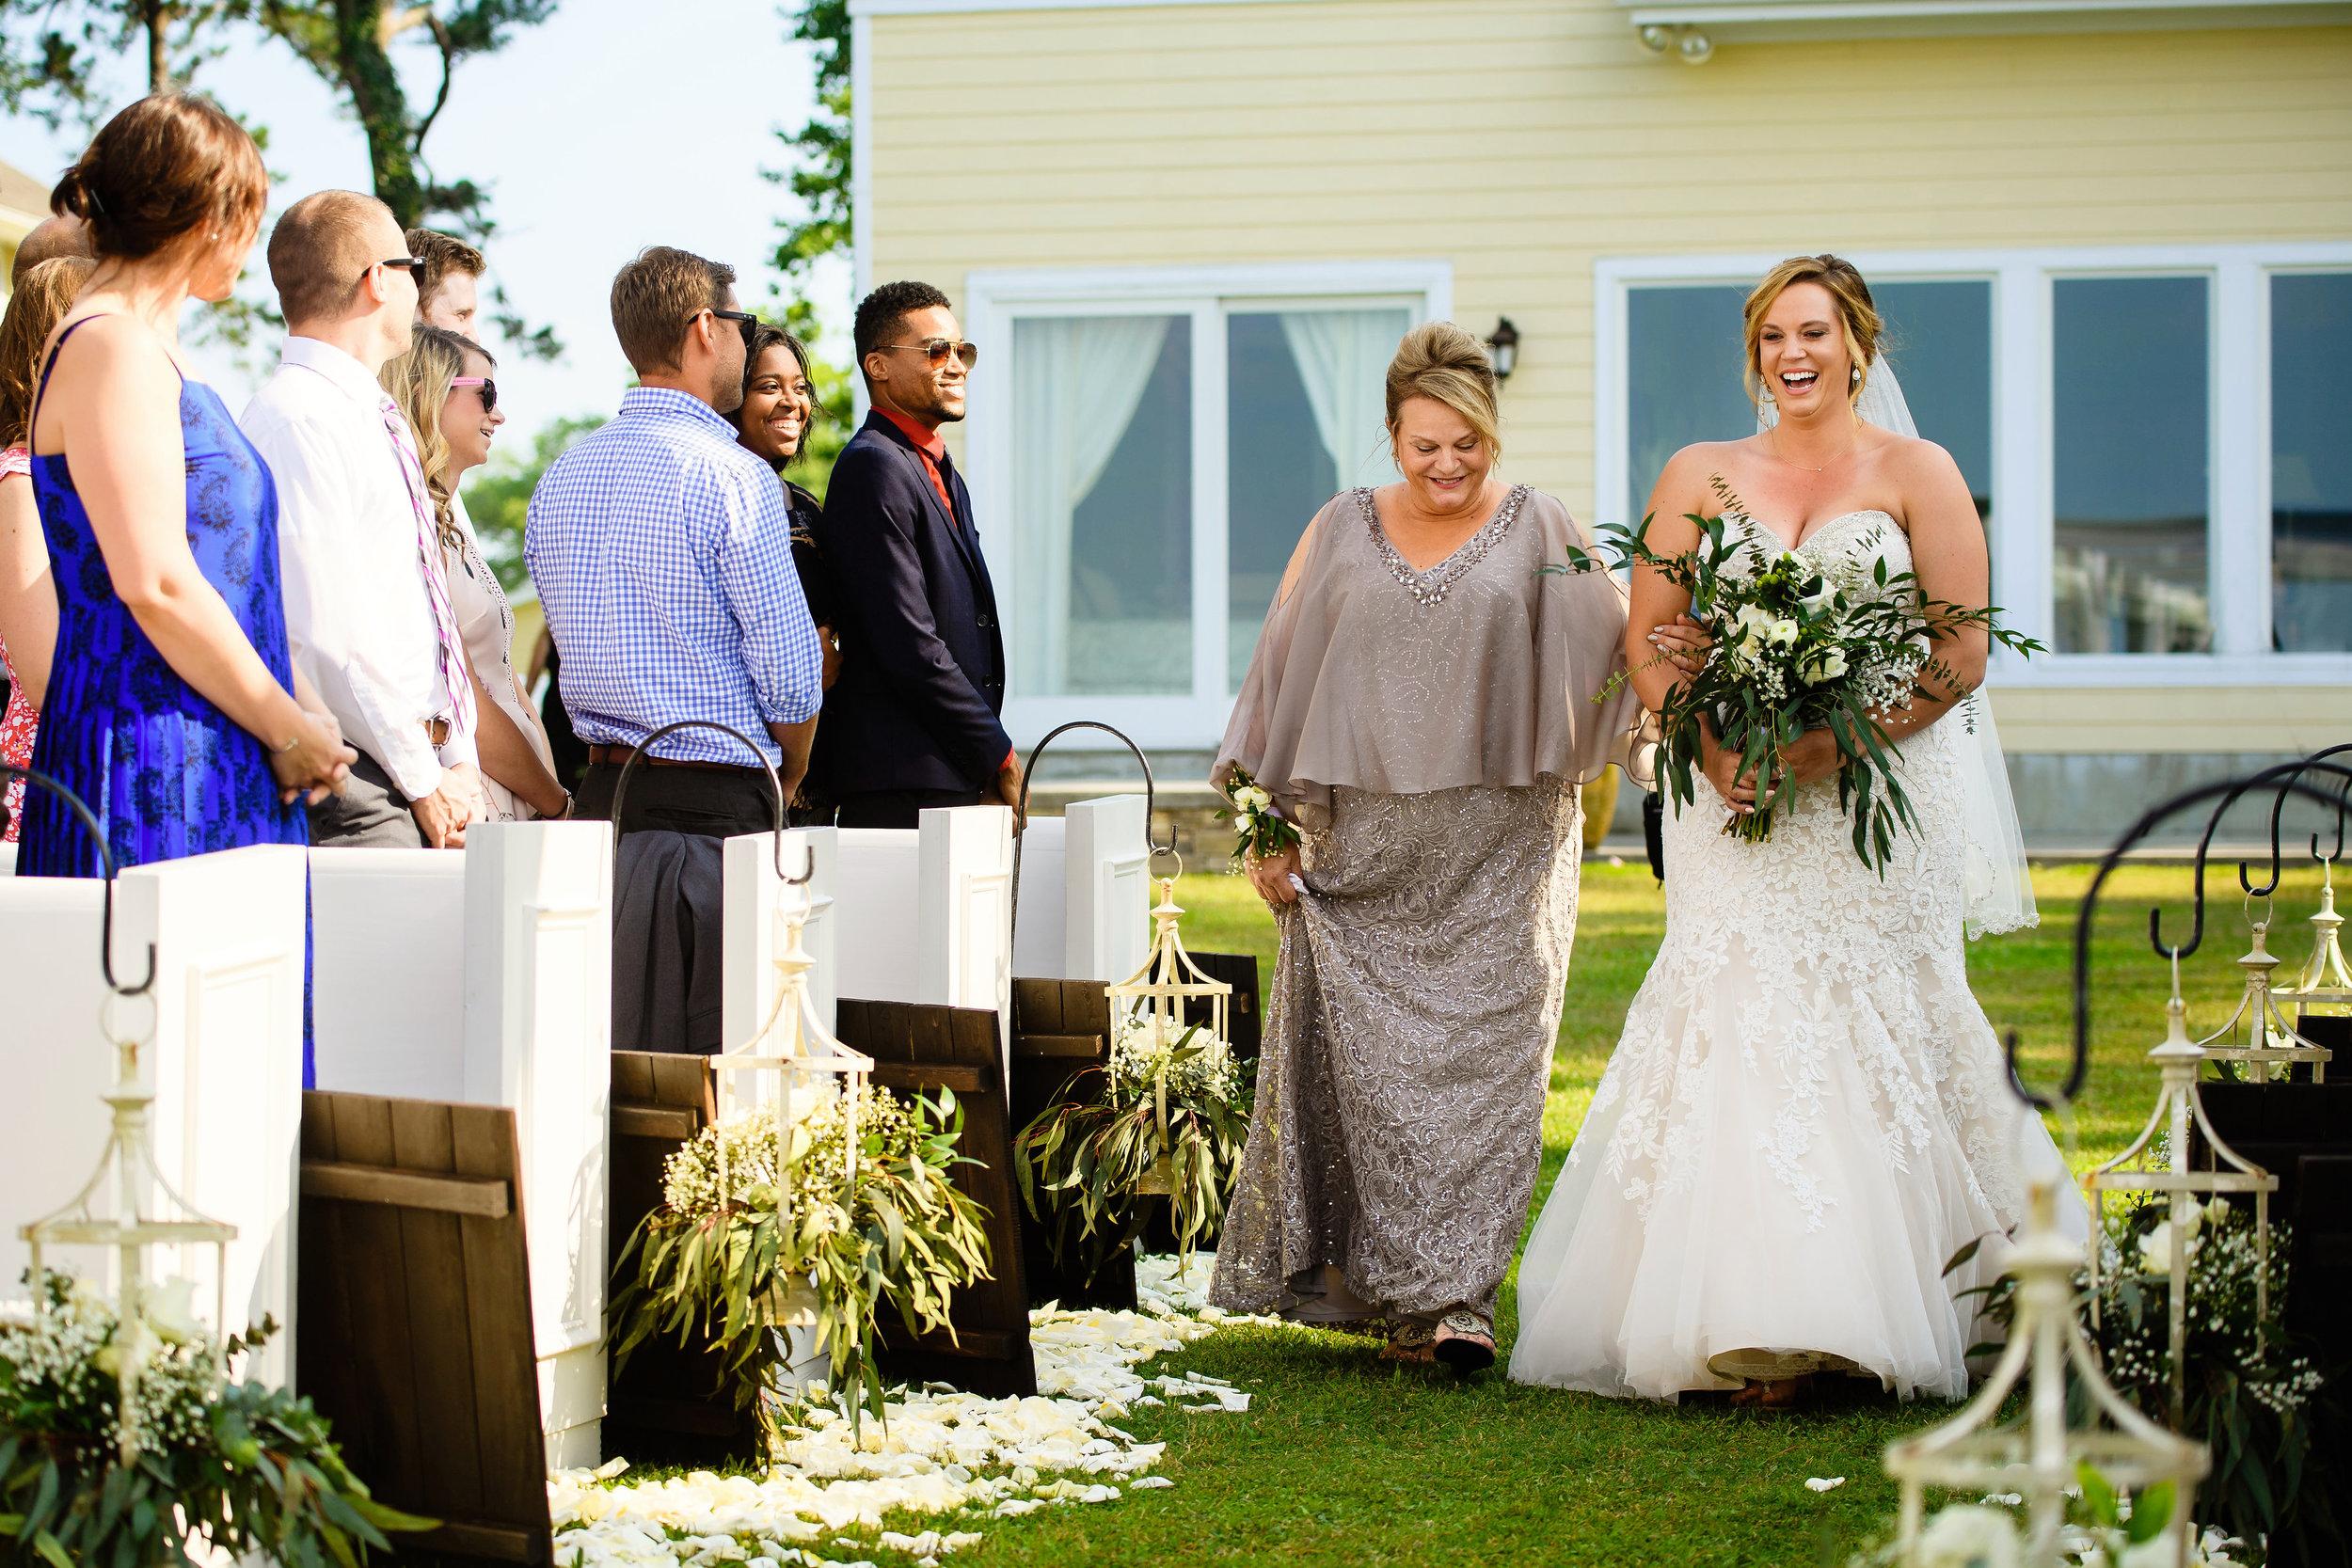 Erica&Jake_Wedding358.jpg